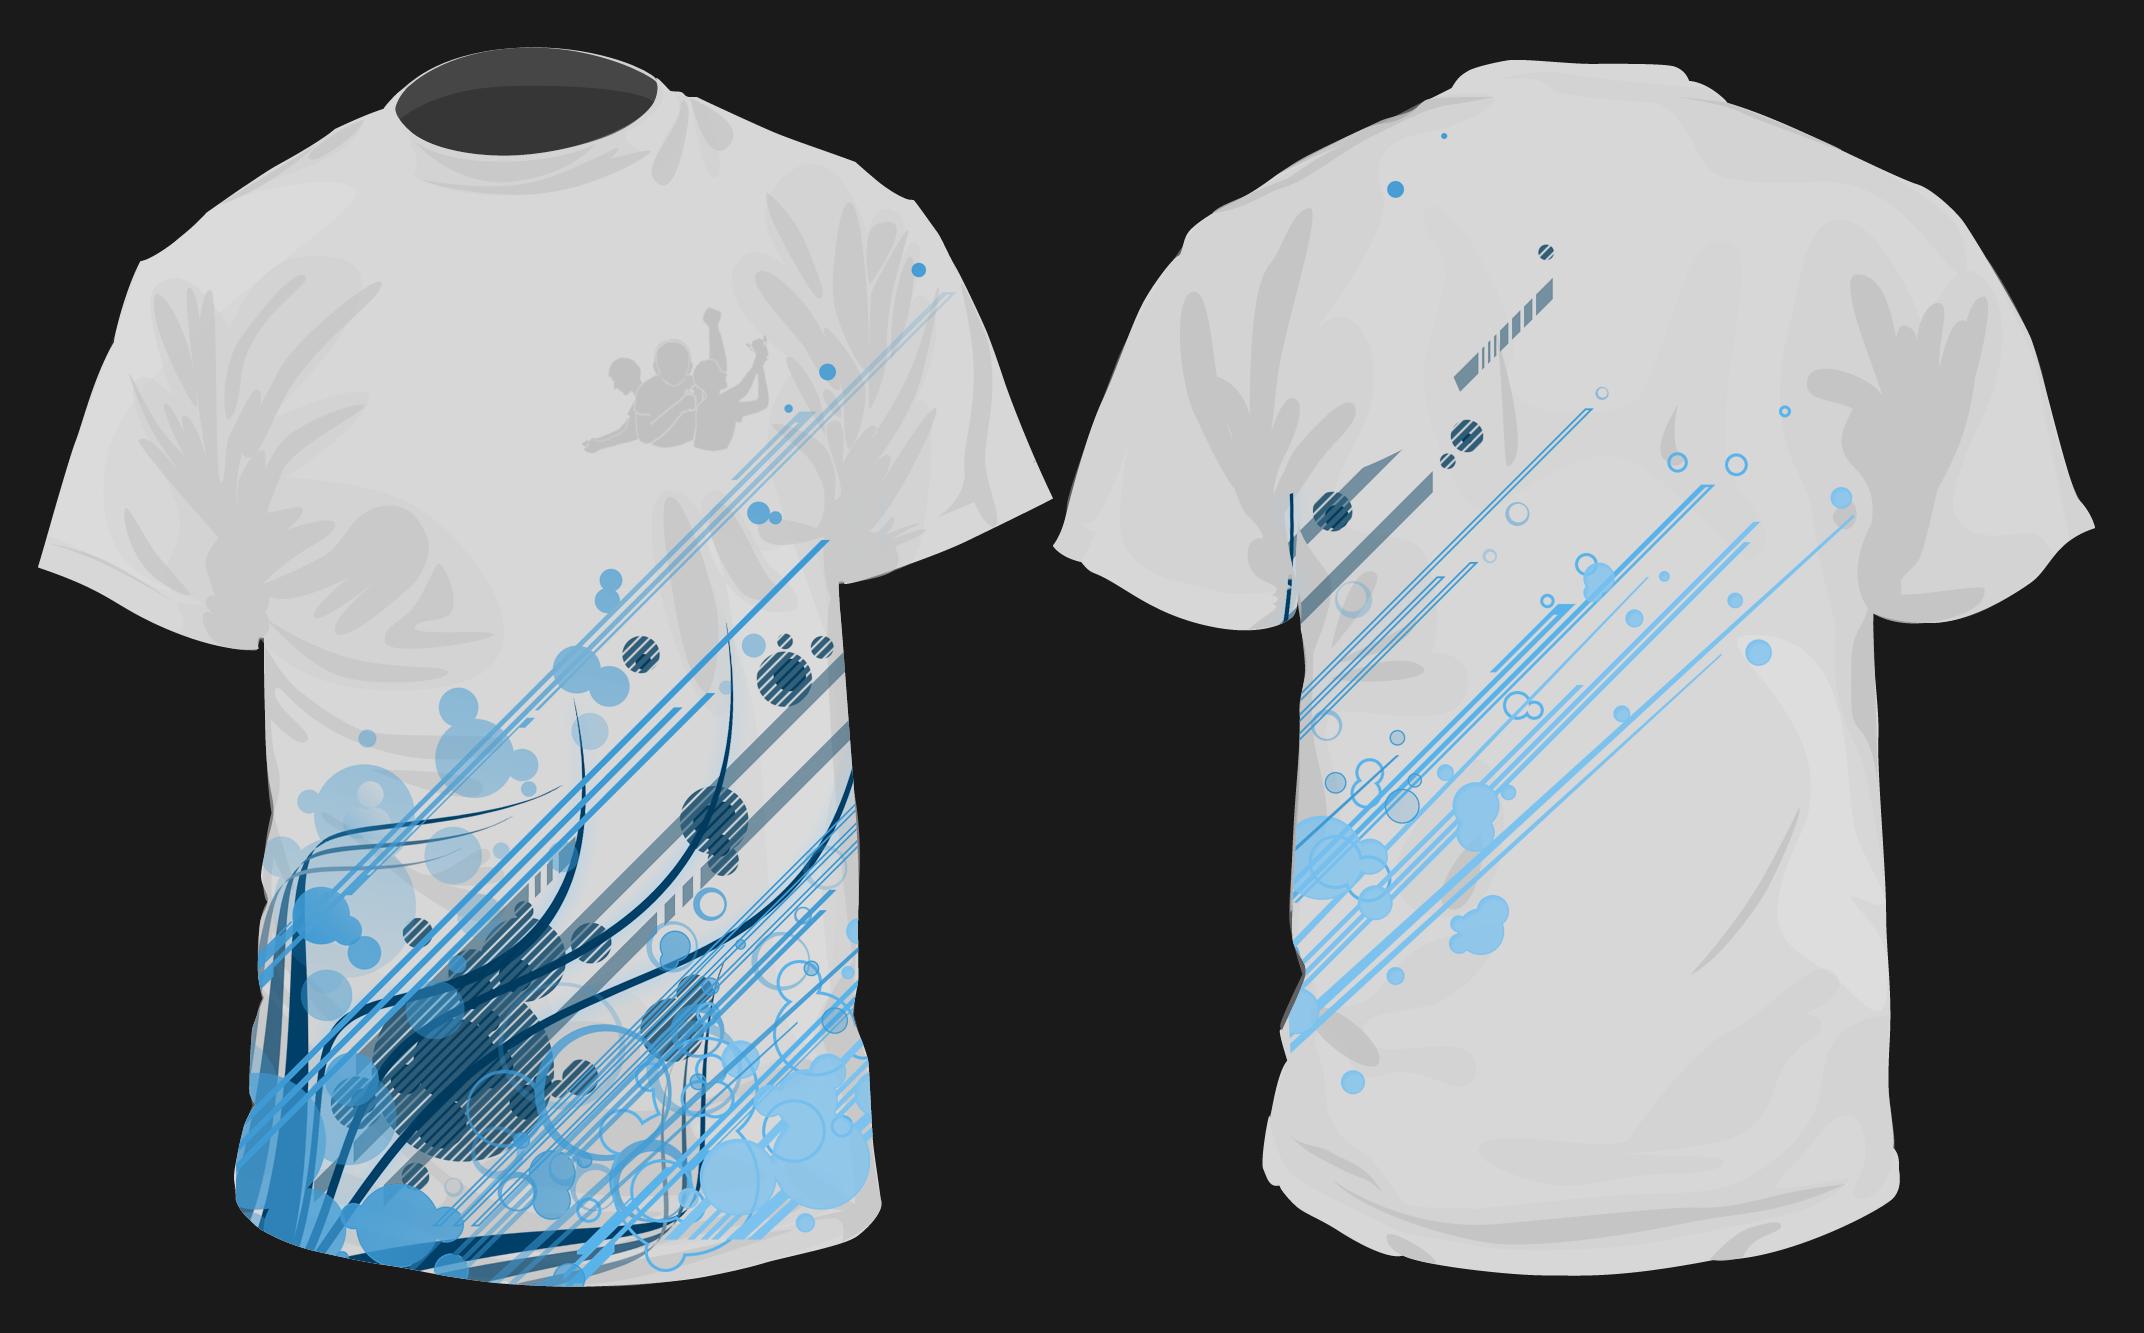 t shirt design ideas create the best custom t shirts photos - T Shirts Design Ideas